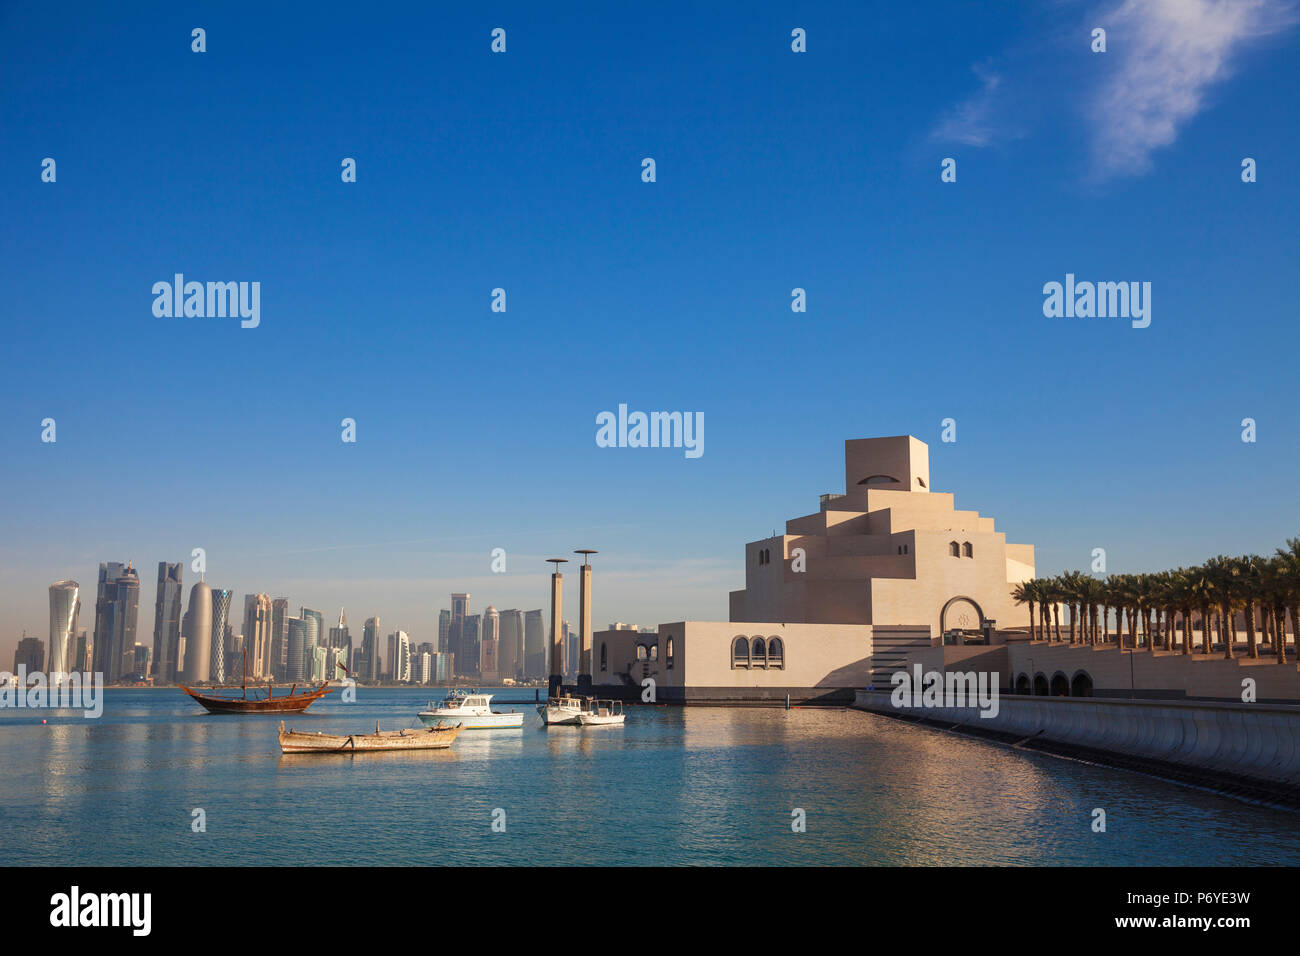 Qatar, Doha, Museum of Islamic Art - Stock Image